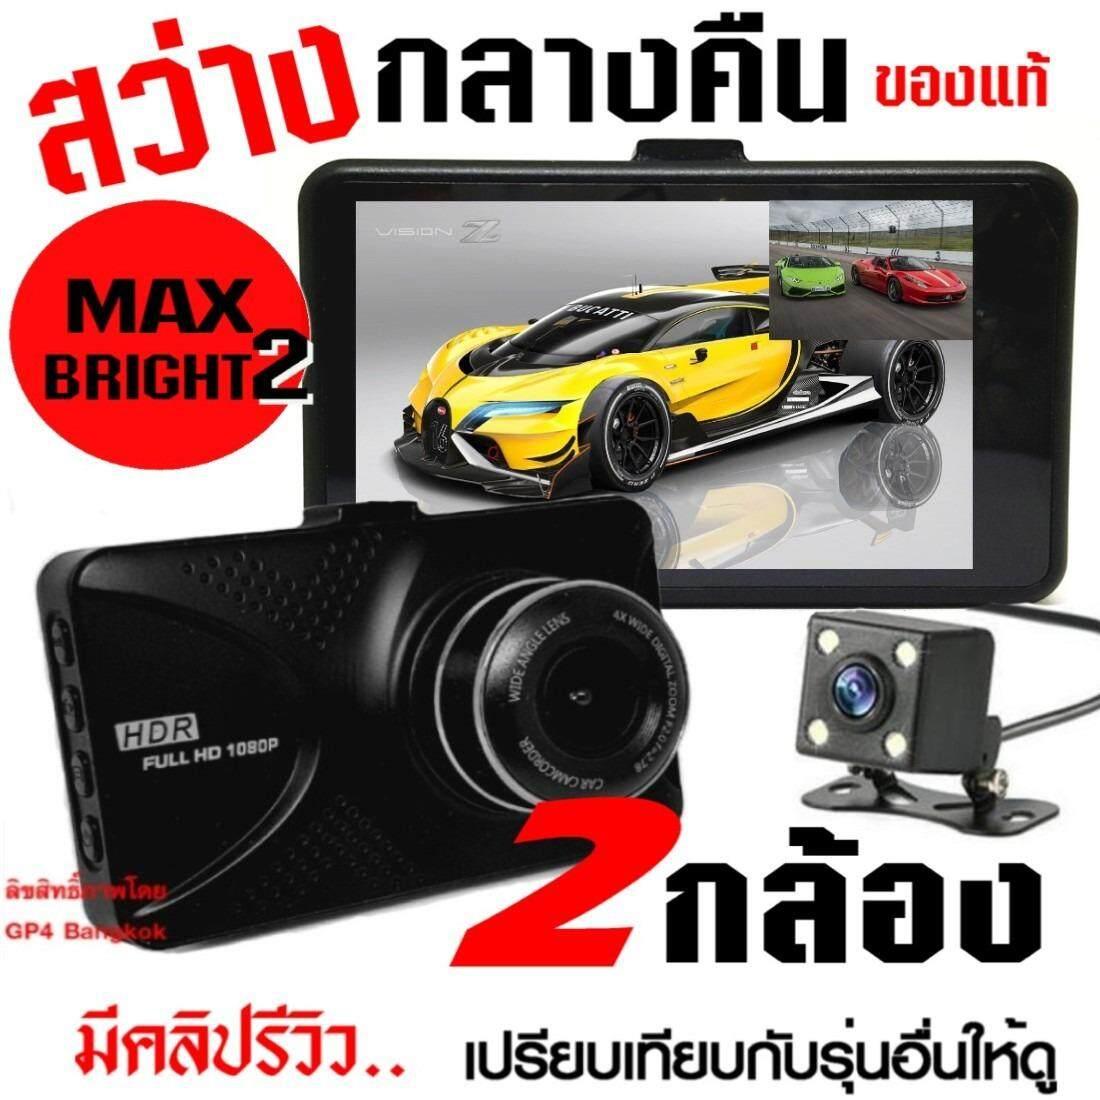 "GP4 กล้องติดรถยนต์ 2กล้อง หน้า-หลัง WDR+HDR ทำงานร่วมกัน2ระบบ Super Night Vision  สว่างกลางคืนของแท้ หน้าจอ 3.2"" เมนูไทย FHD 1080P บอดี้โลหะแข็งแรงทนทาน รุ่น MAX BRIGHT2  (Black) - มีกล้องหลังมาให้พร้อมแล้วในชุด"